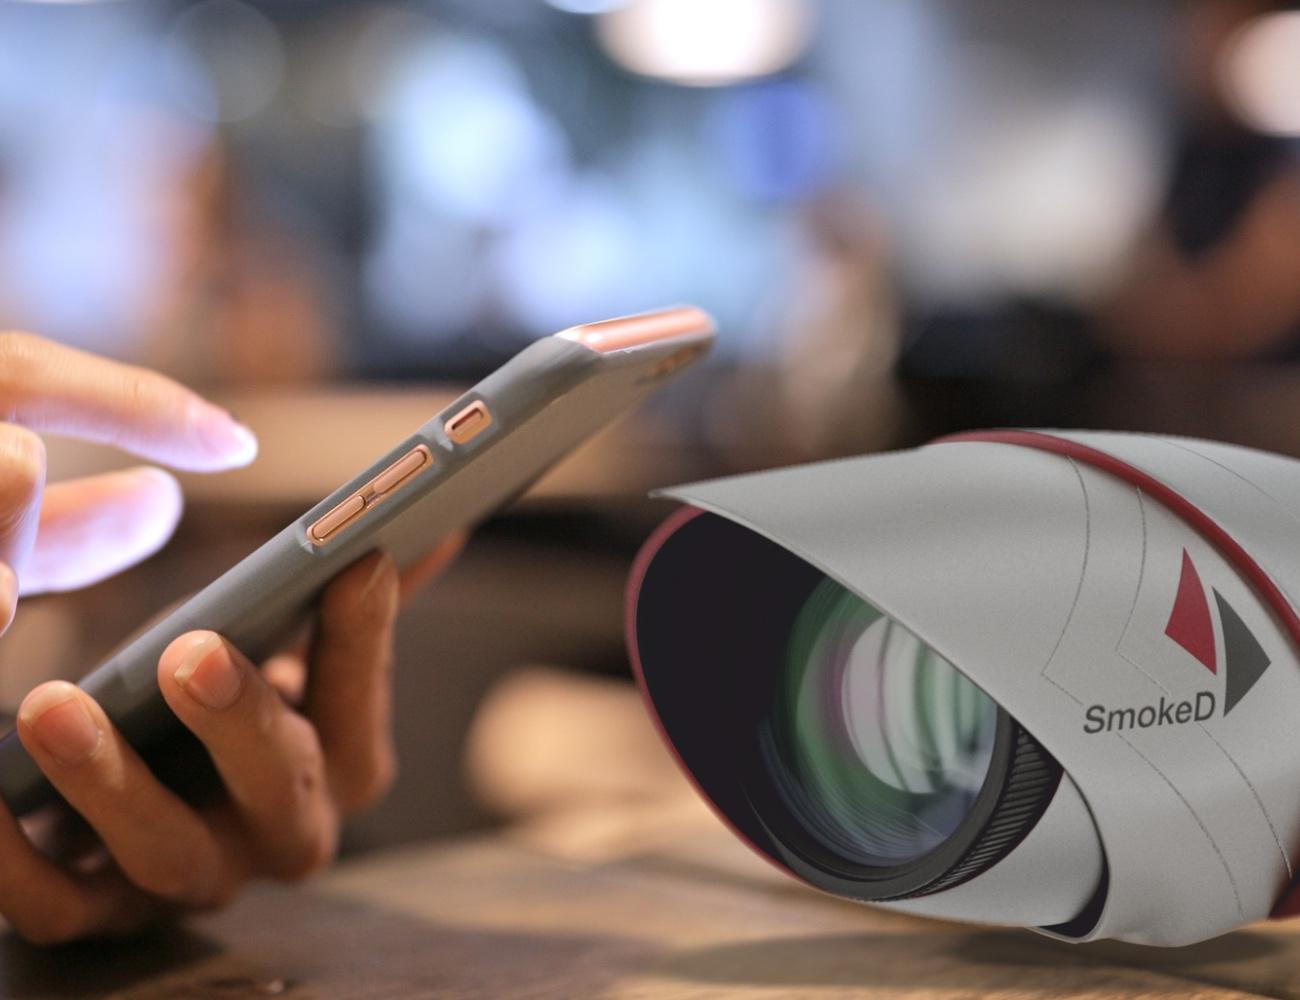 SmokeD Smart Fire Detection Camera